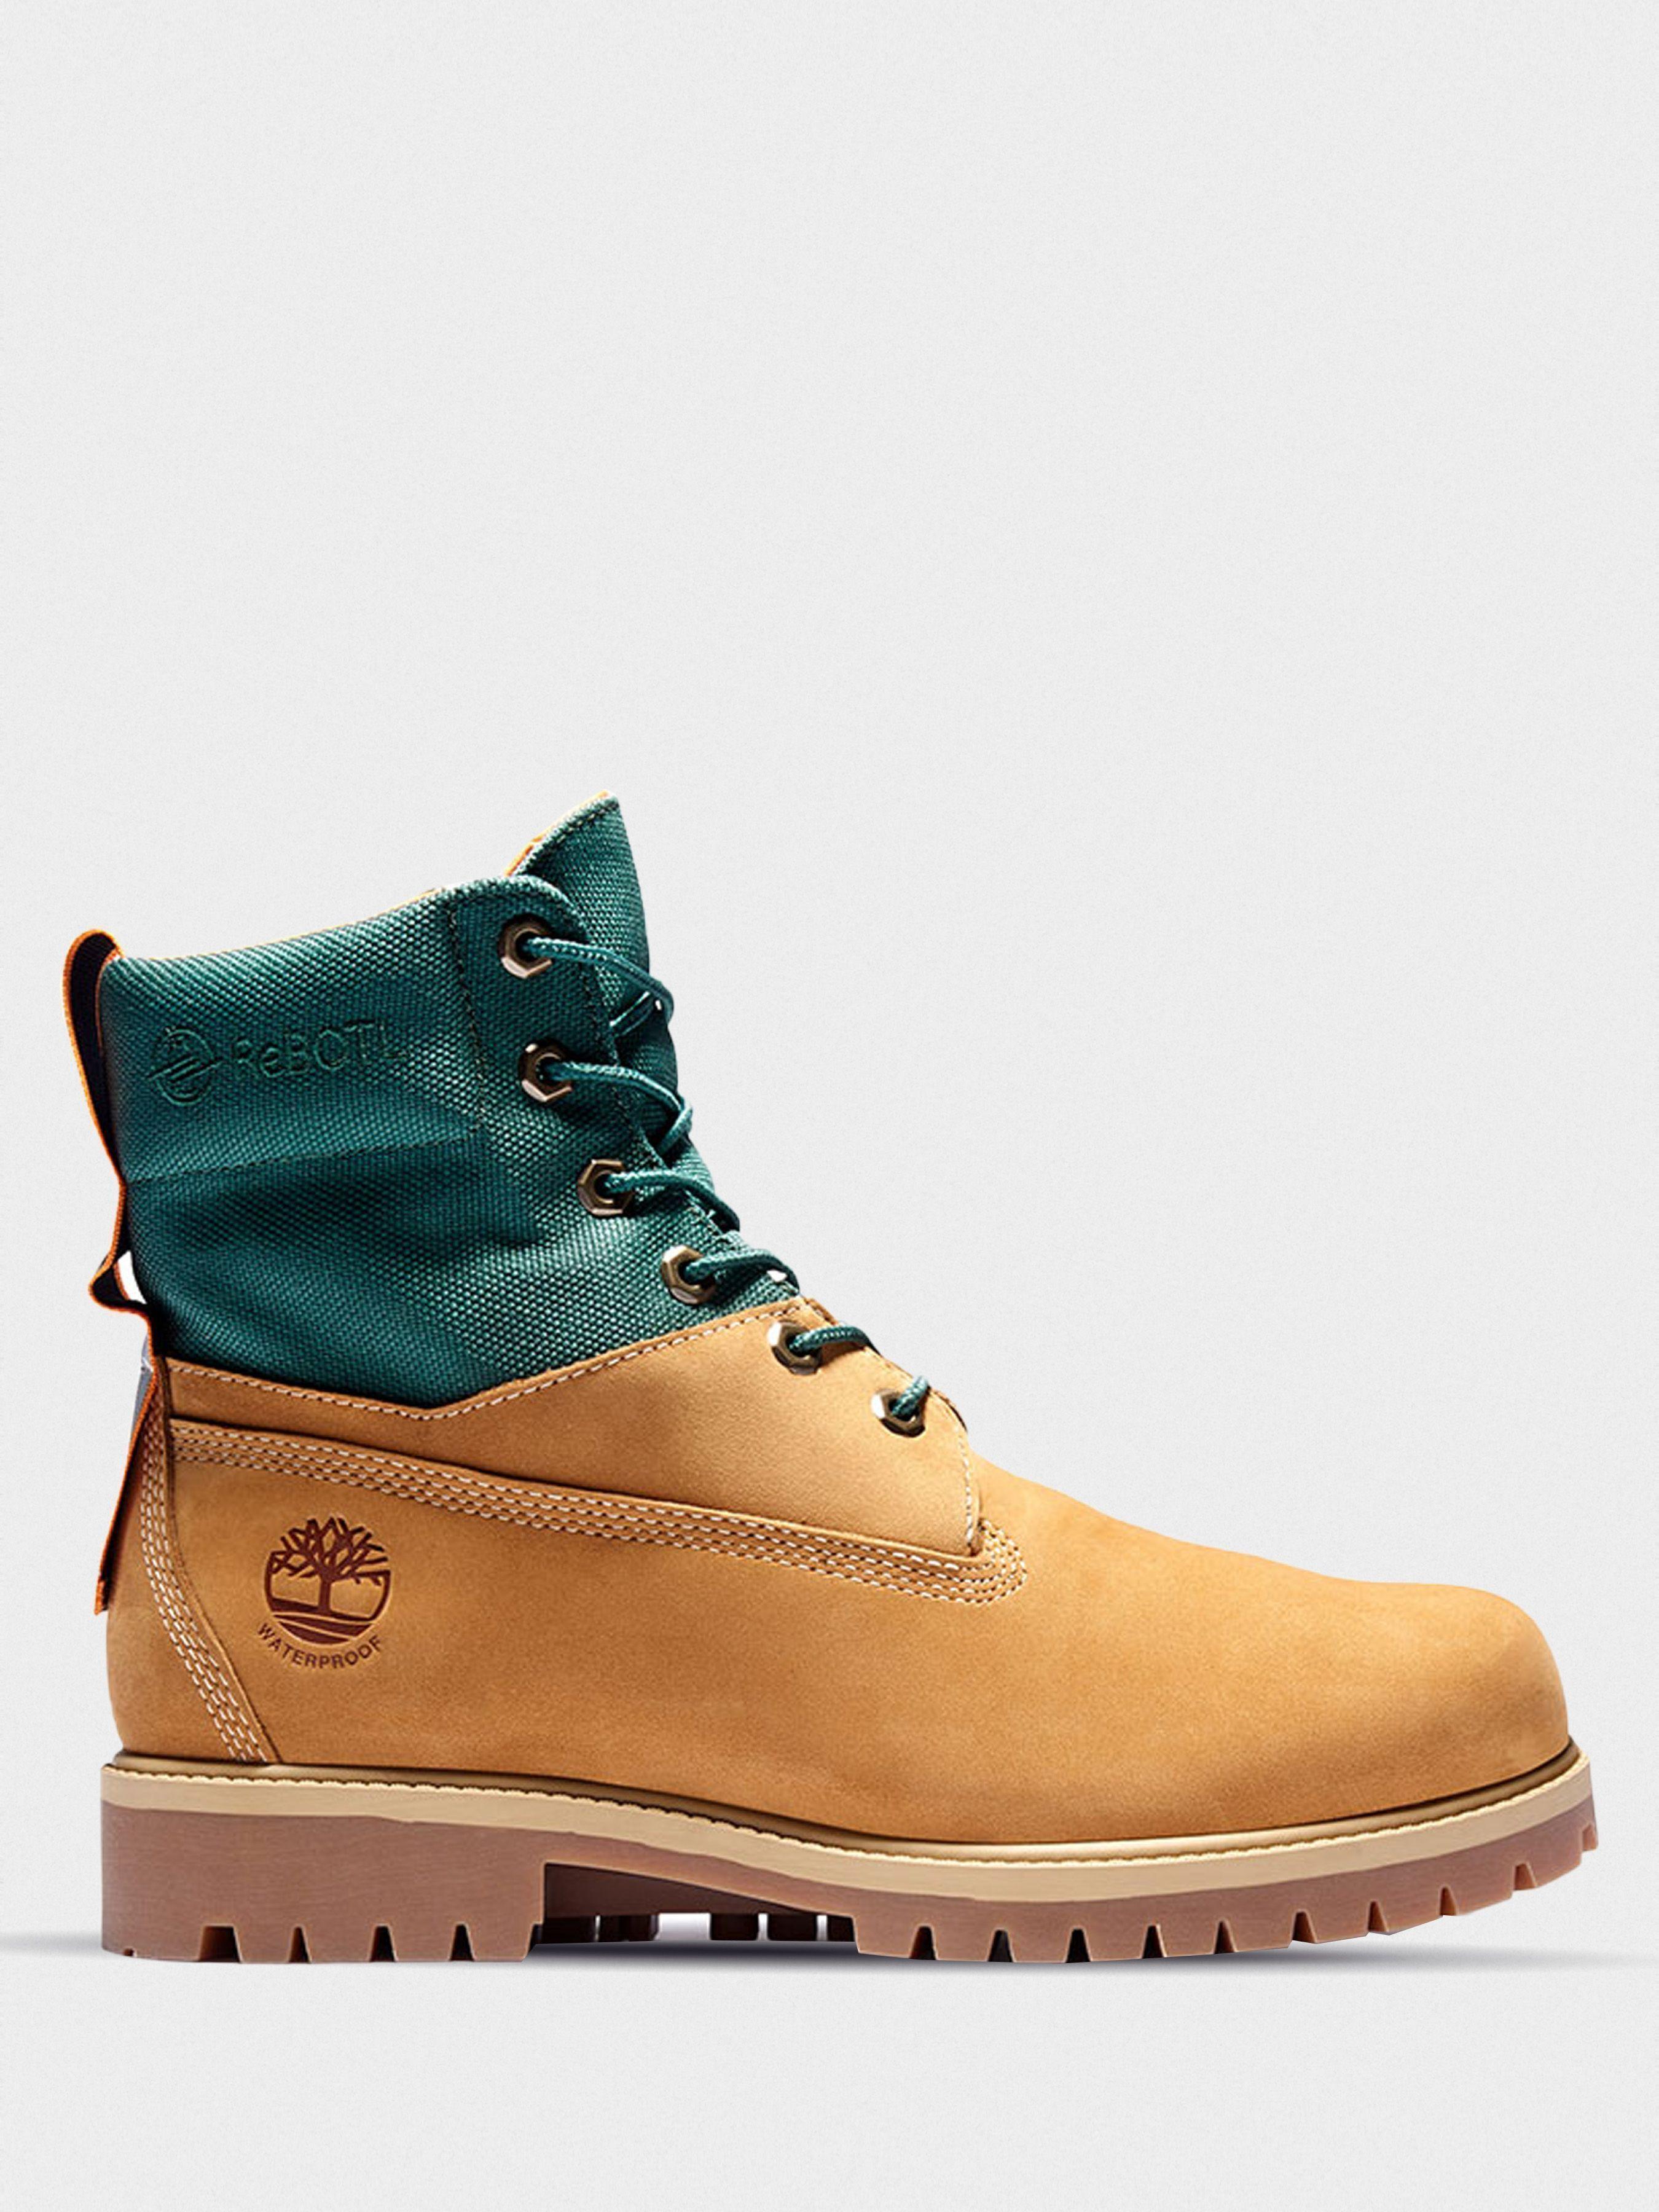 Ботинки мужские Timberland Timberland Premium TB0A2D6U231